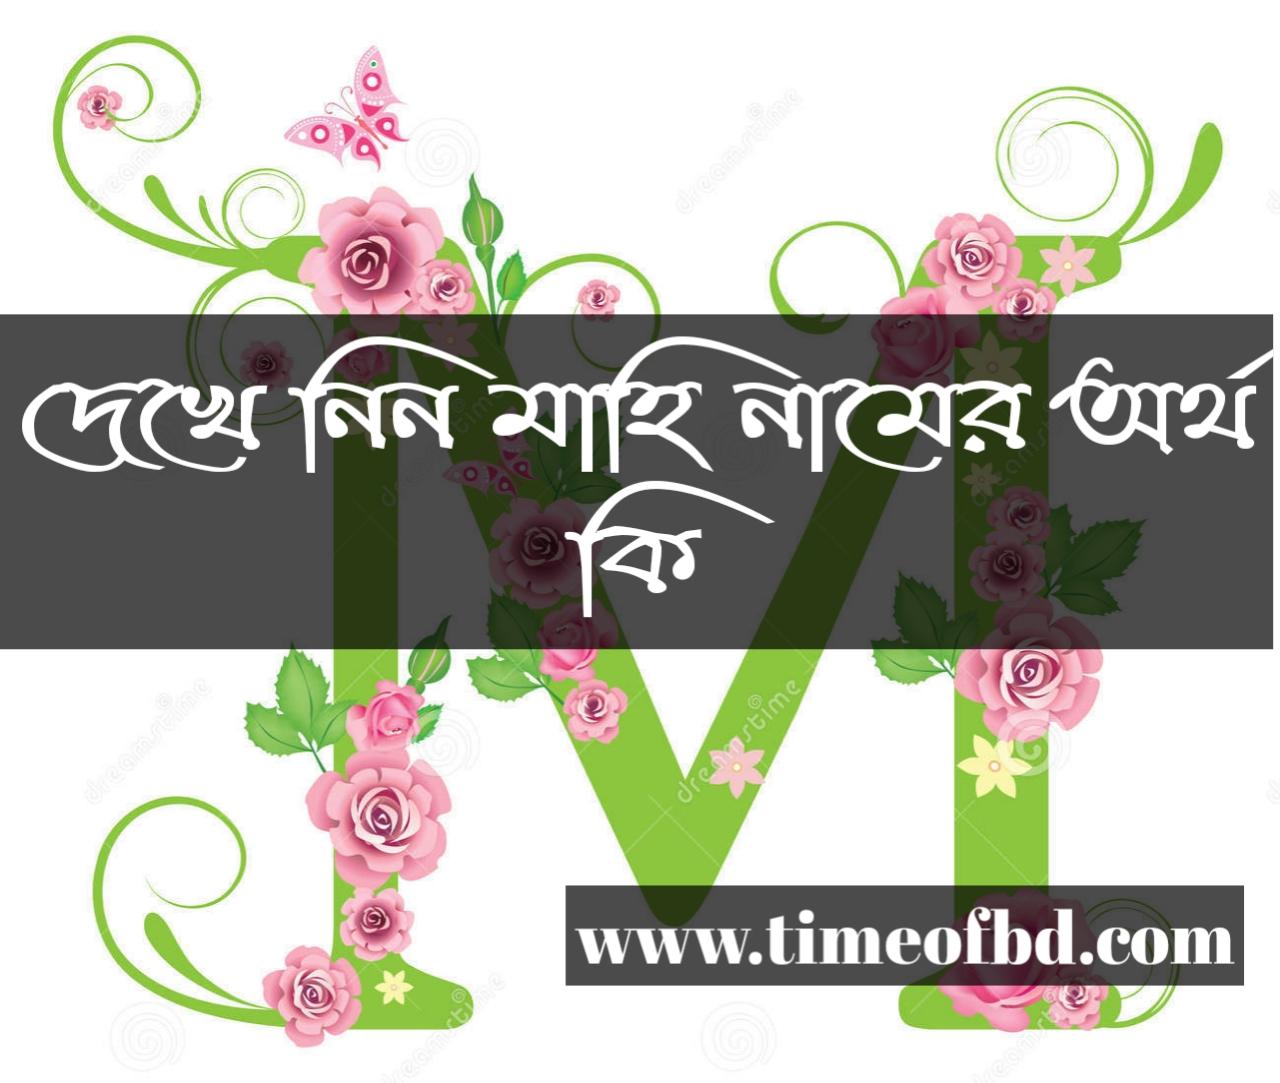 Mahi name meaning in Bengali, মাহি নামের অর্থ কি, মাহি নামের বাংলা অর্থ কি, মাহি নামের ইসলামিক অর্থ কি,